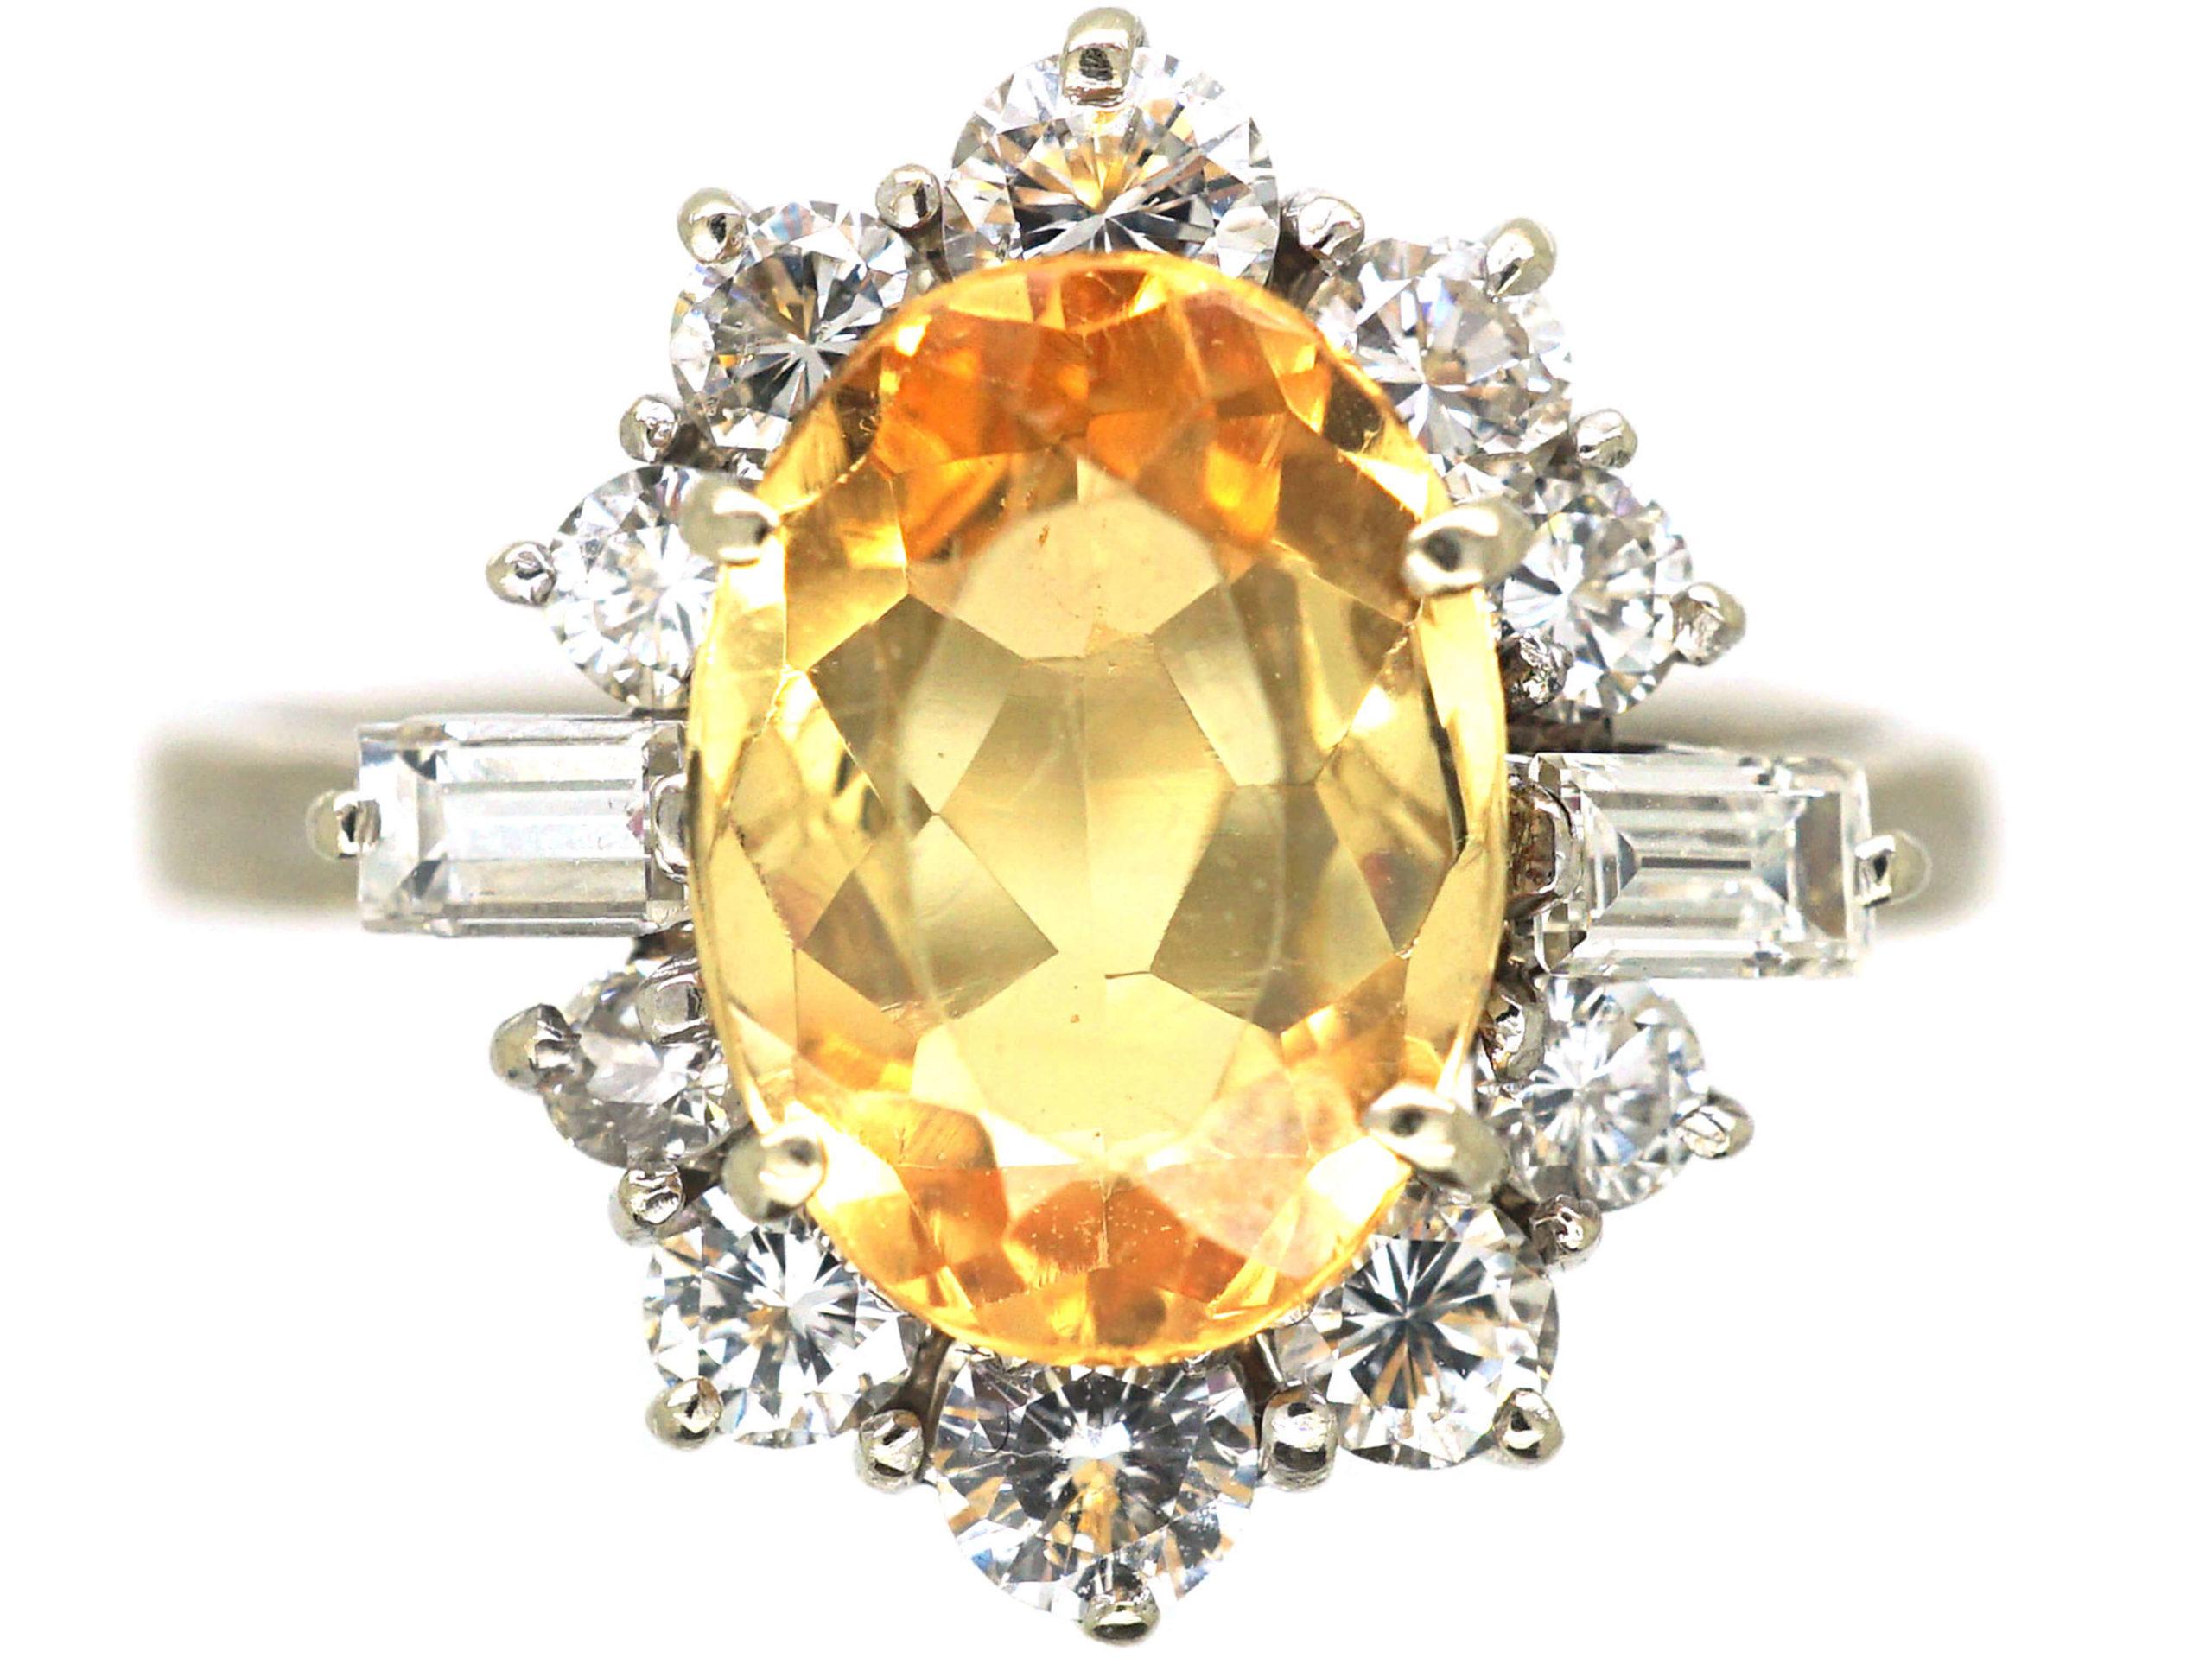 18ct White Gold, Topaz & Diamond Ring